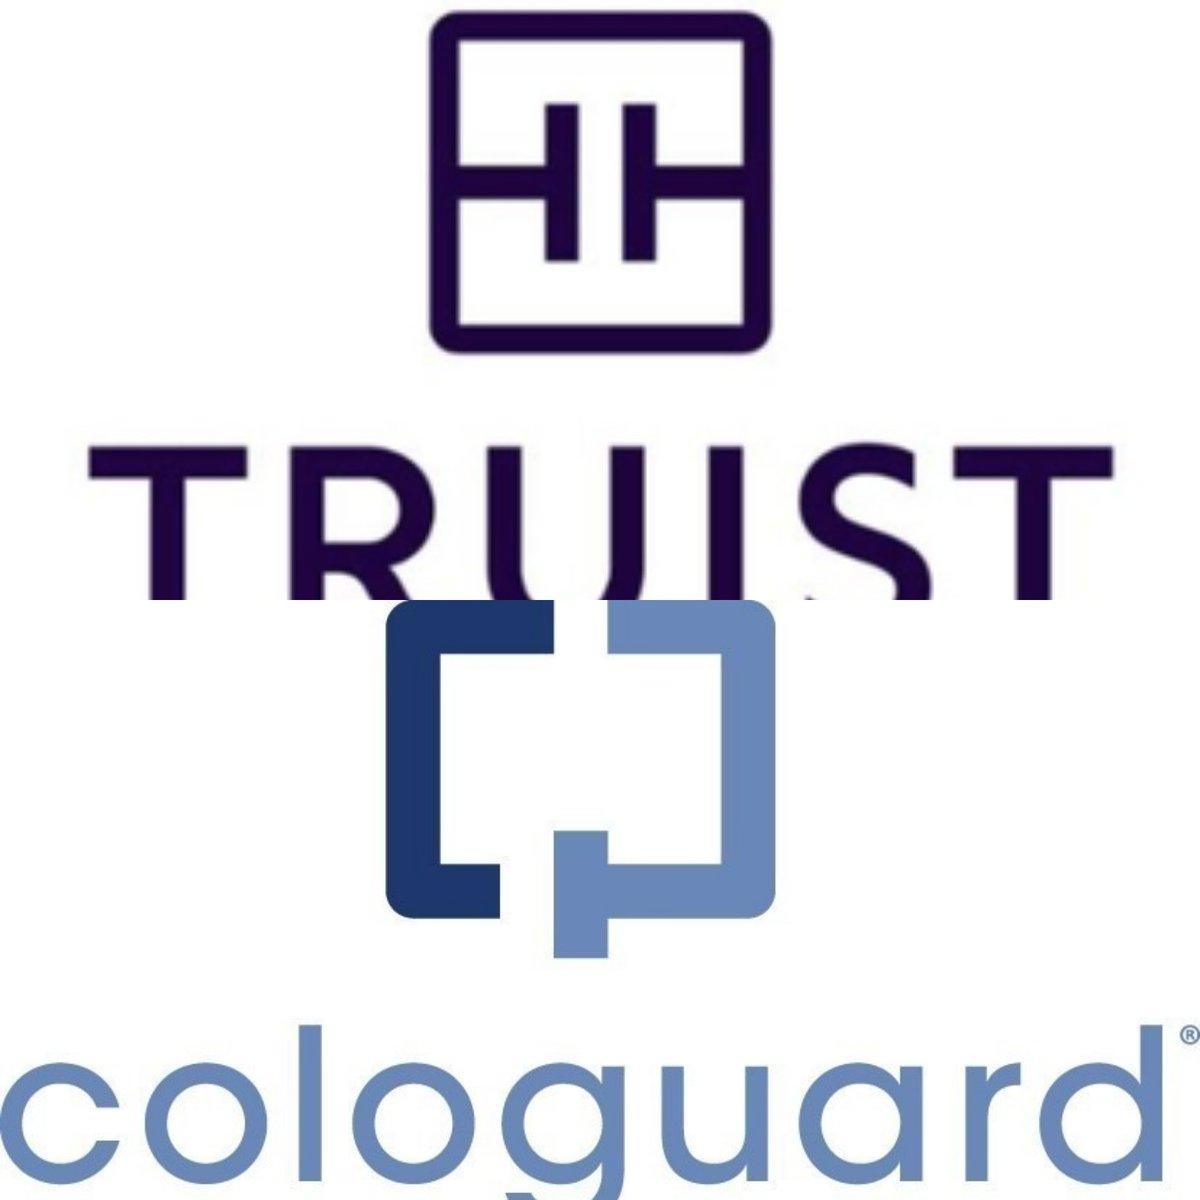 I thought I had seen the Truist Park logo somewhere #truistpark